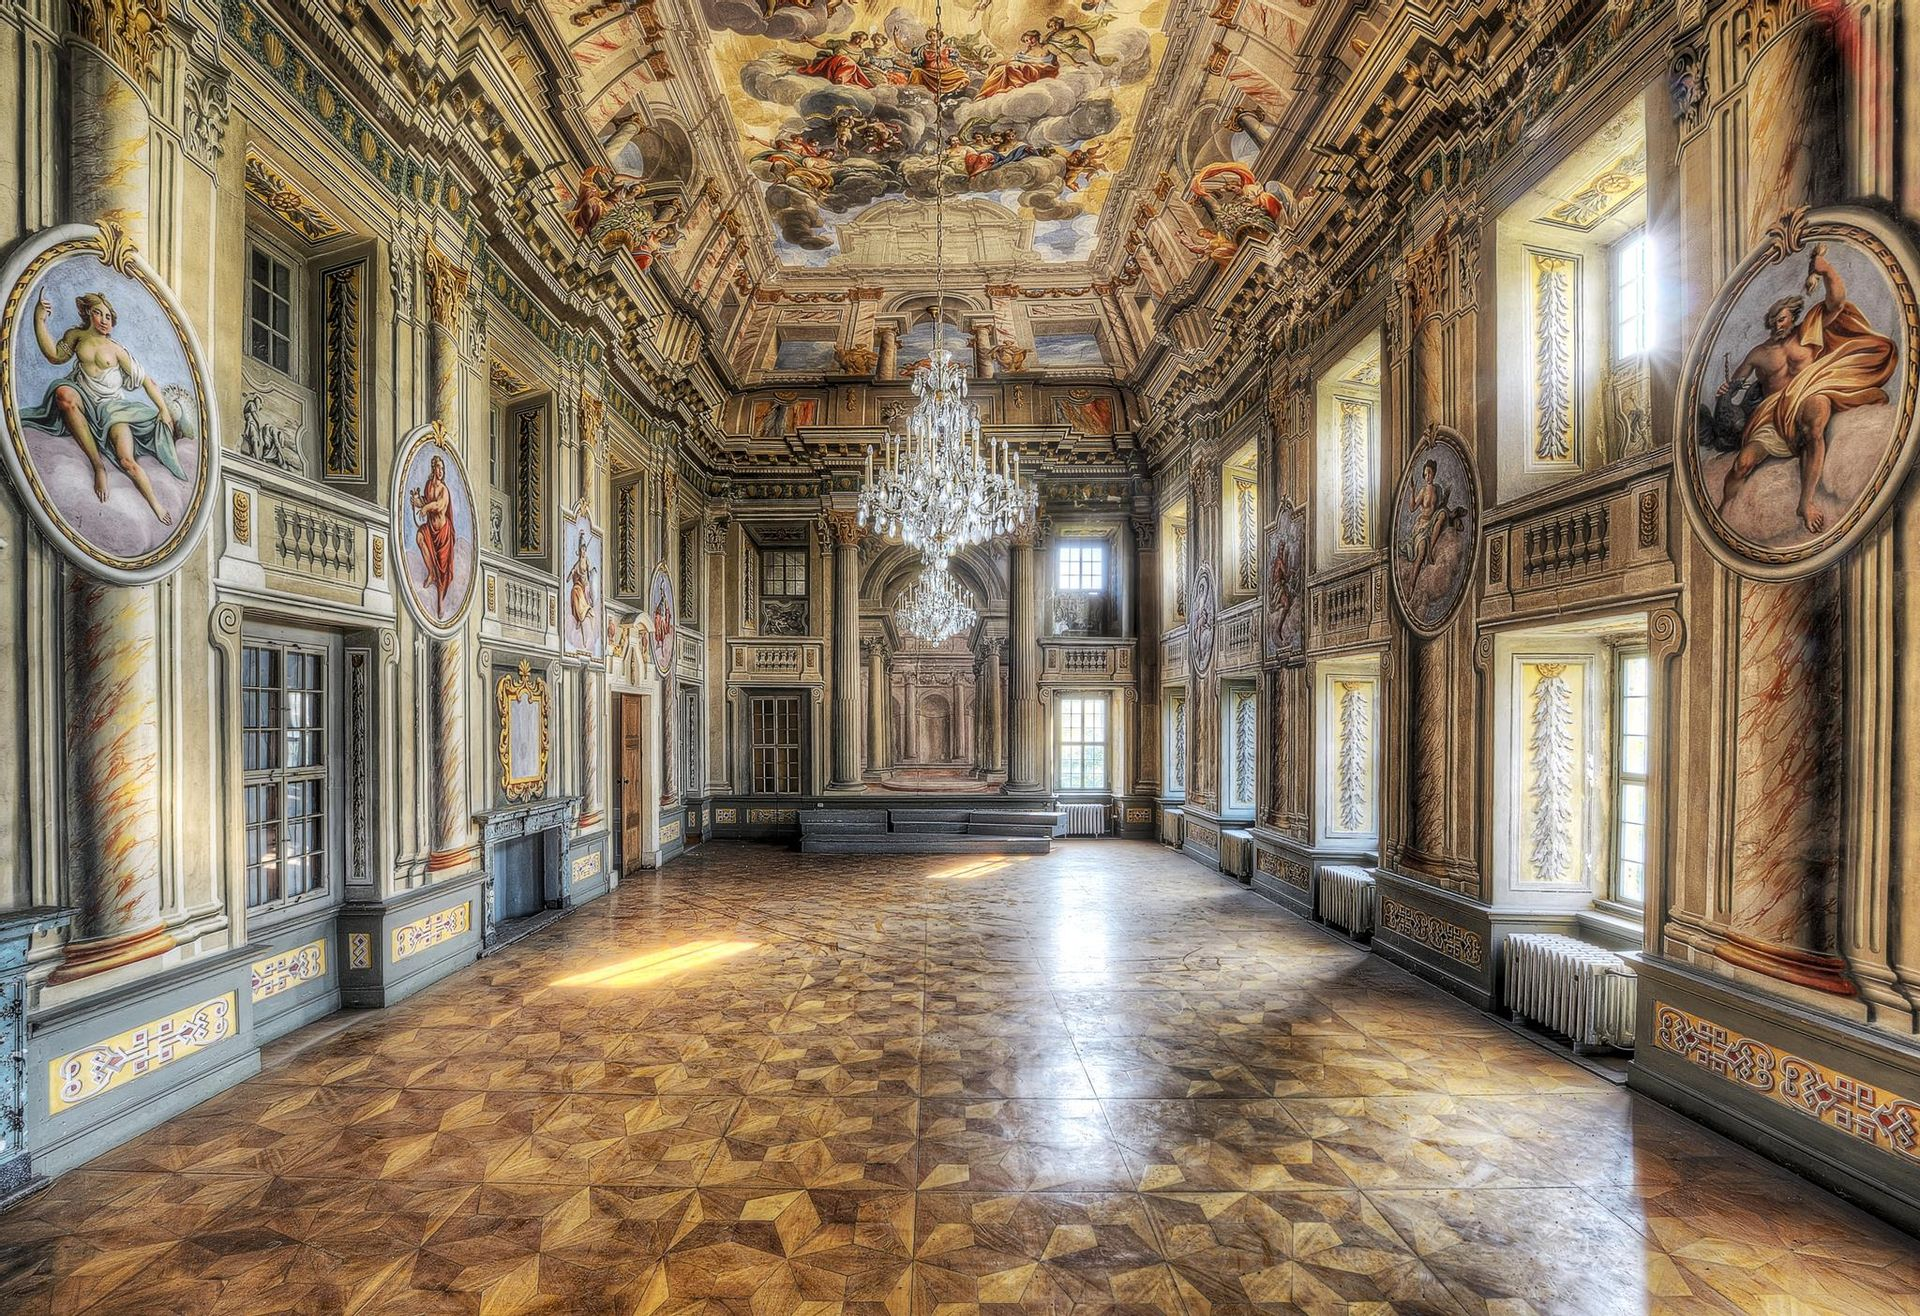 Herzlich Willkommen! | Schloss Crossen